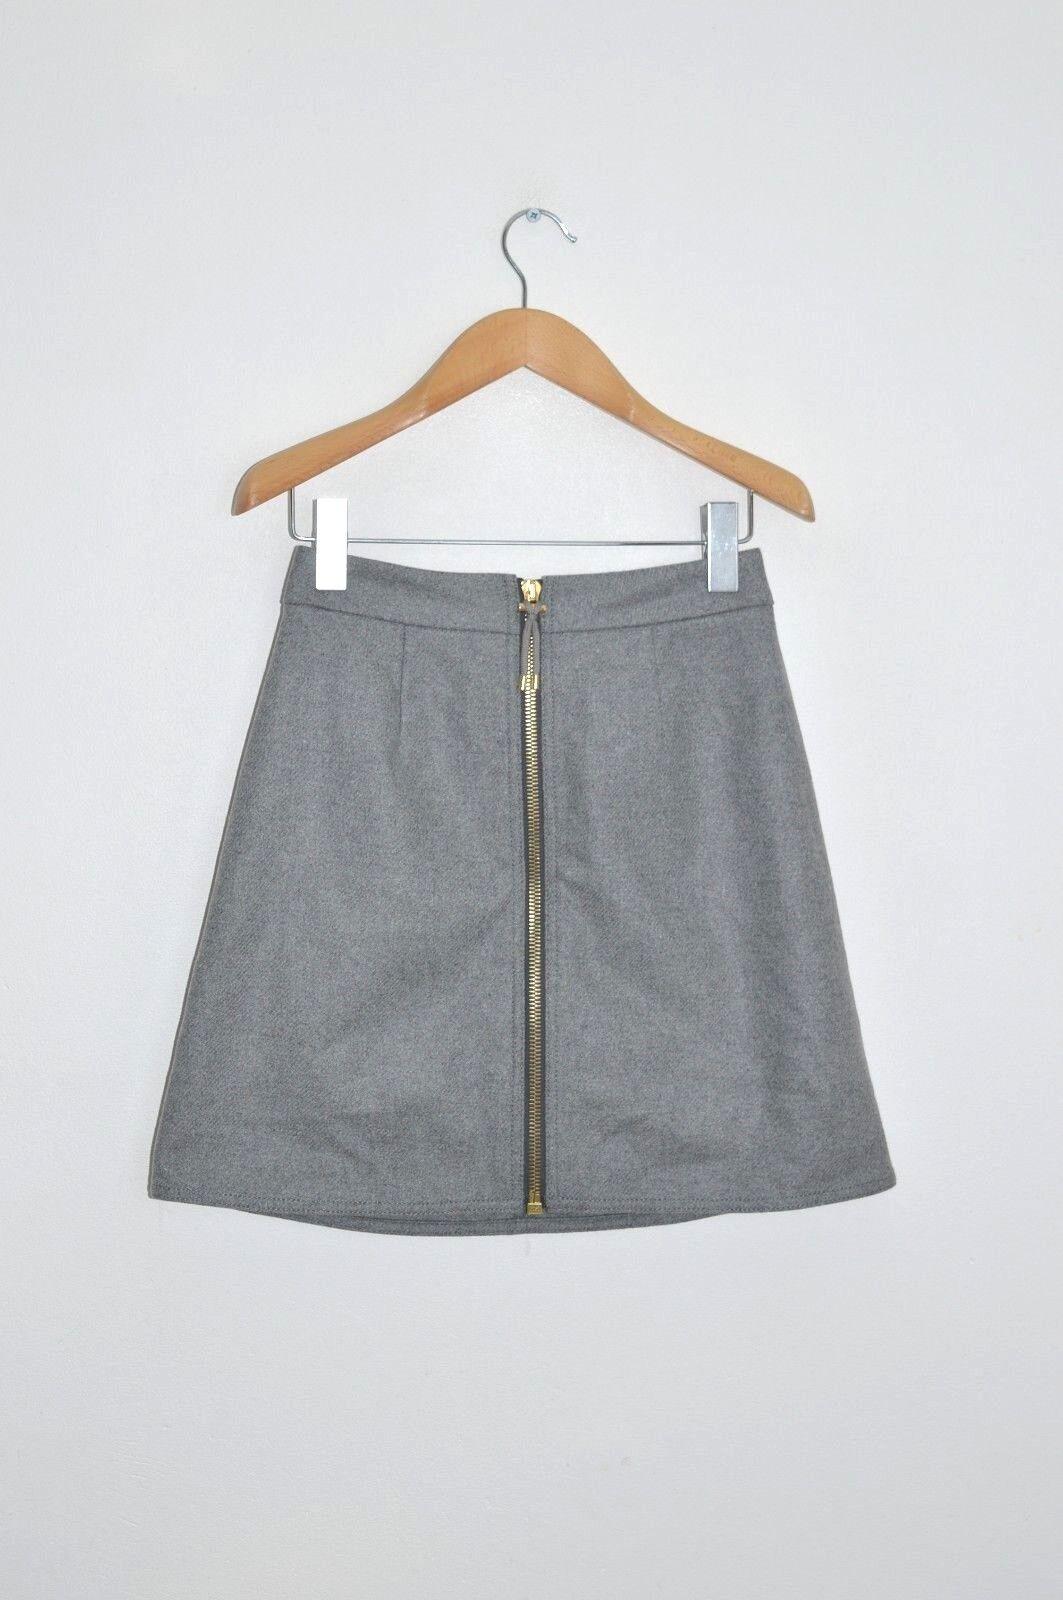 STUNNING ACNE Studios Ladies PRISCA Wool PAW16 Mini Skirt UK8 US4 EU34